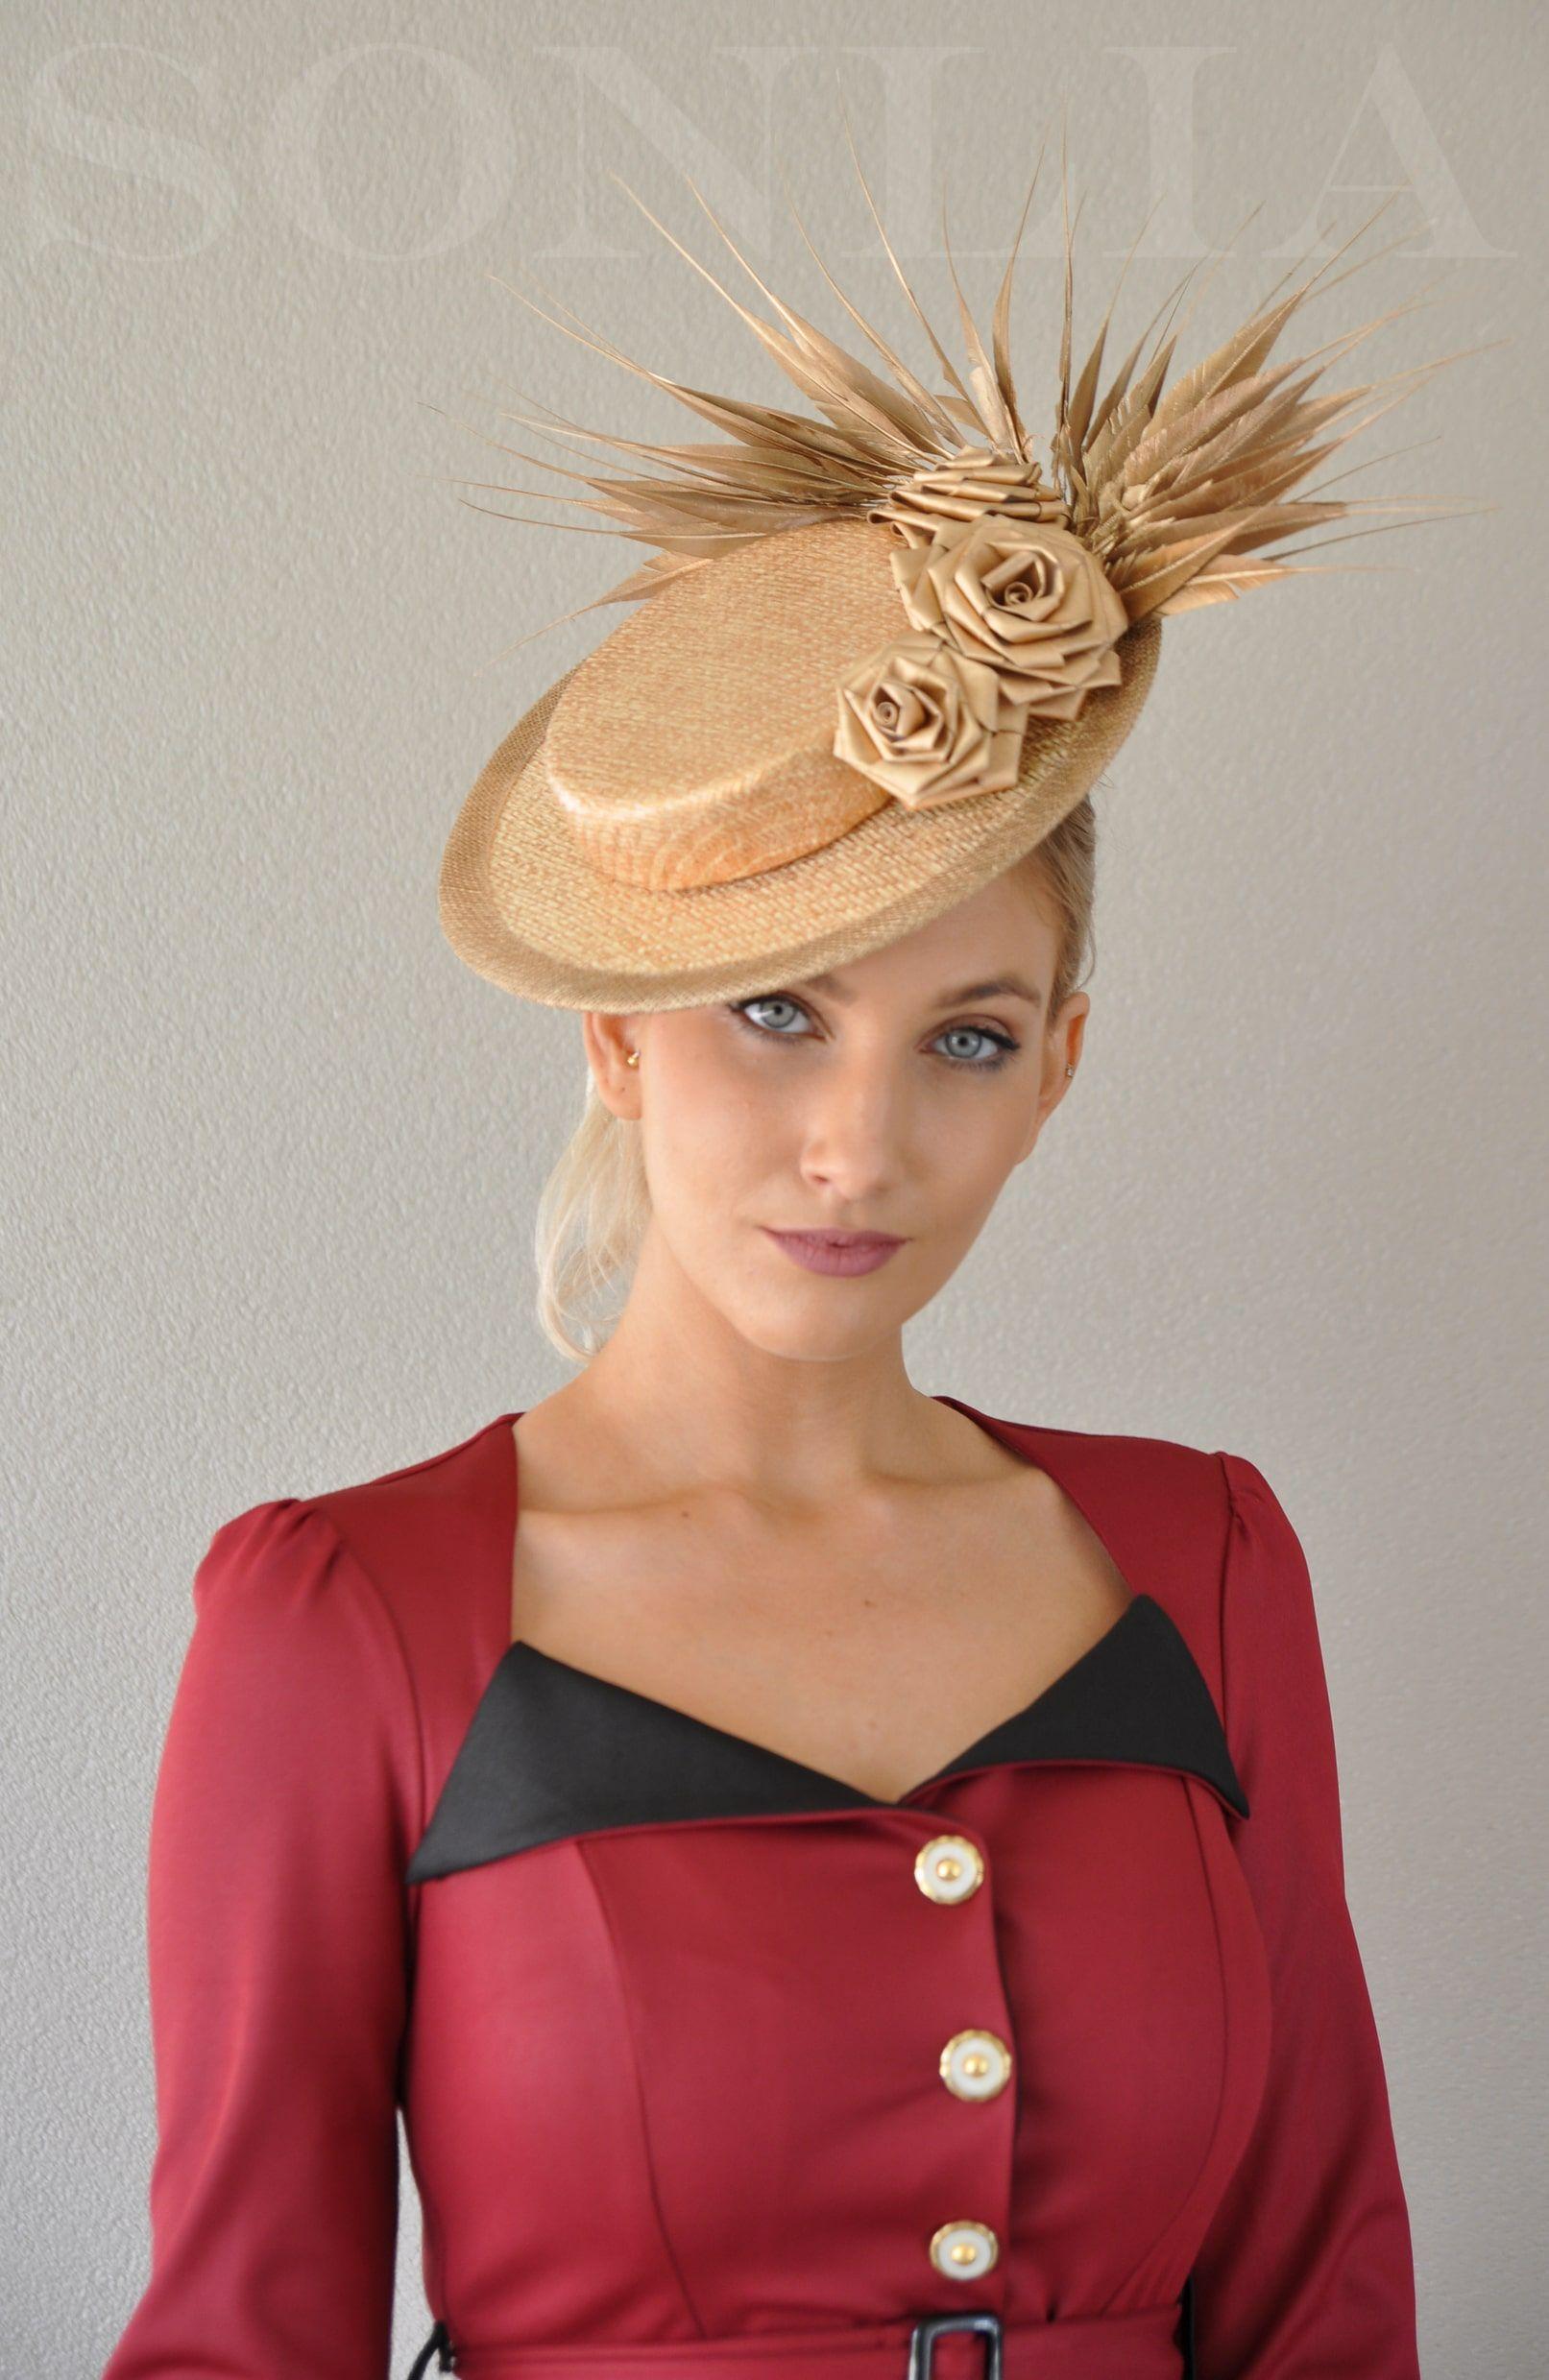 00fc5c6774365 Agustina Boater'' Sonlia Millinery - Sonlia Fashion | Hats | Hats ...